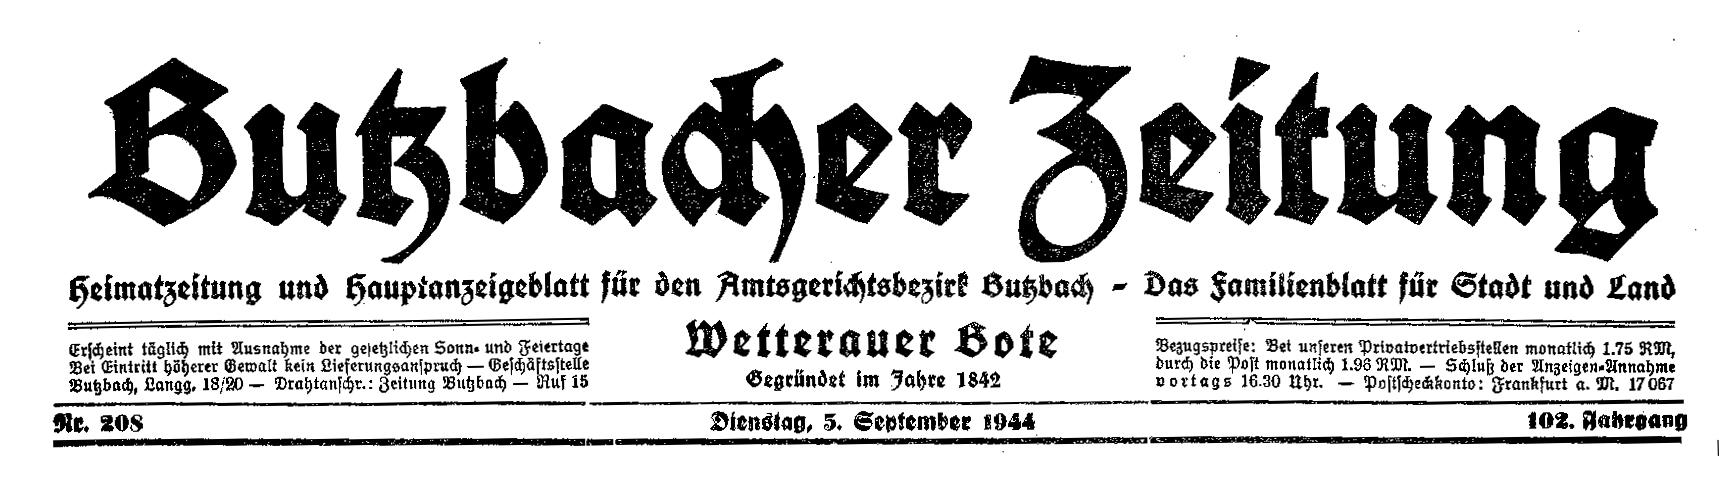 Zeitungskopf_11